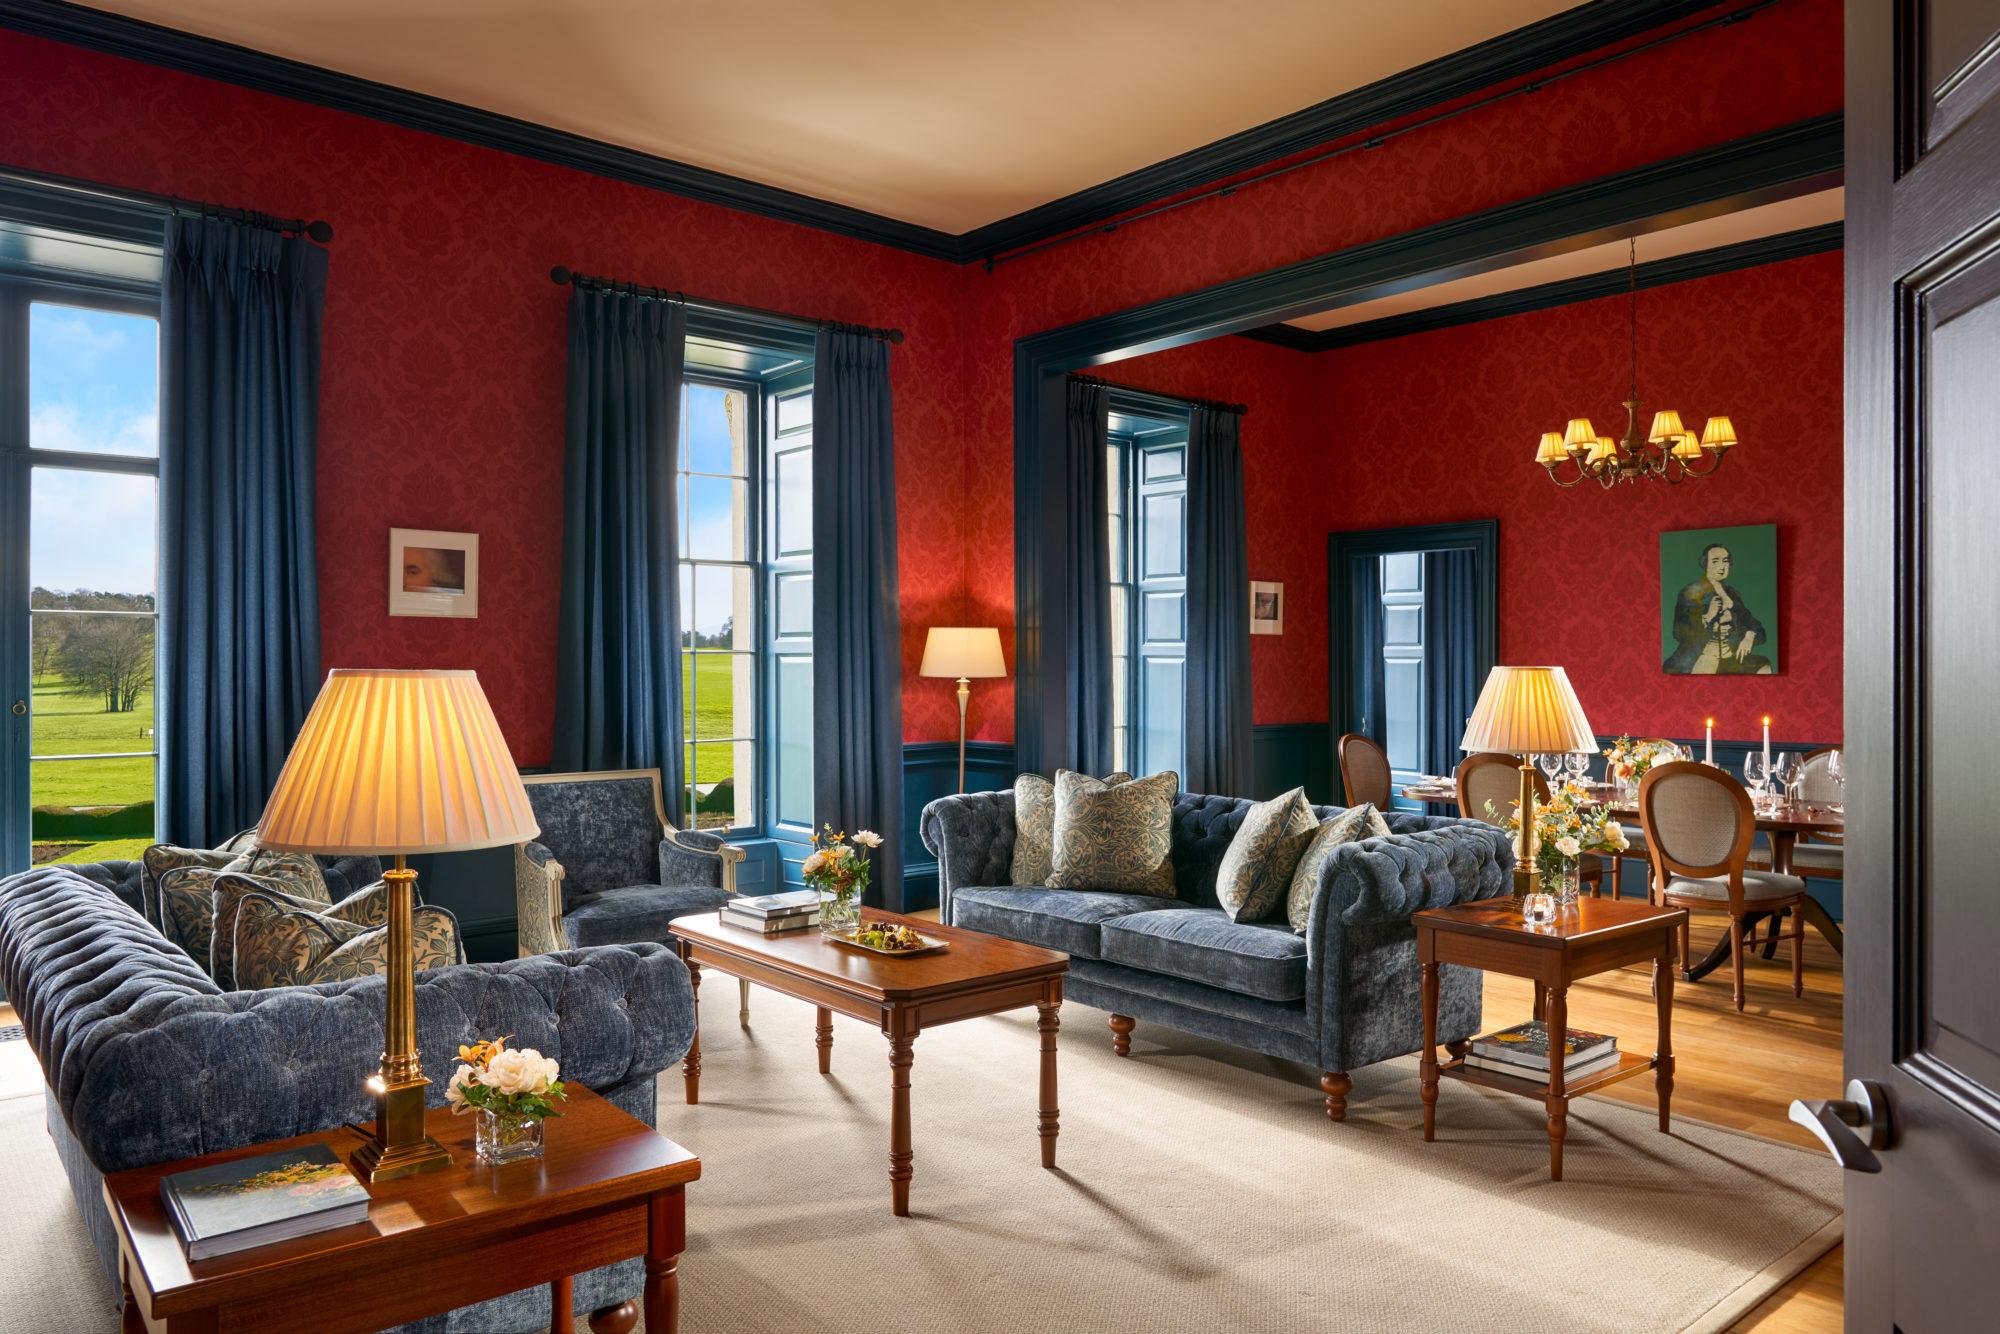 House Presidential Suite at Carton House – The Duke sitting room – copyright Carton House-jpg